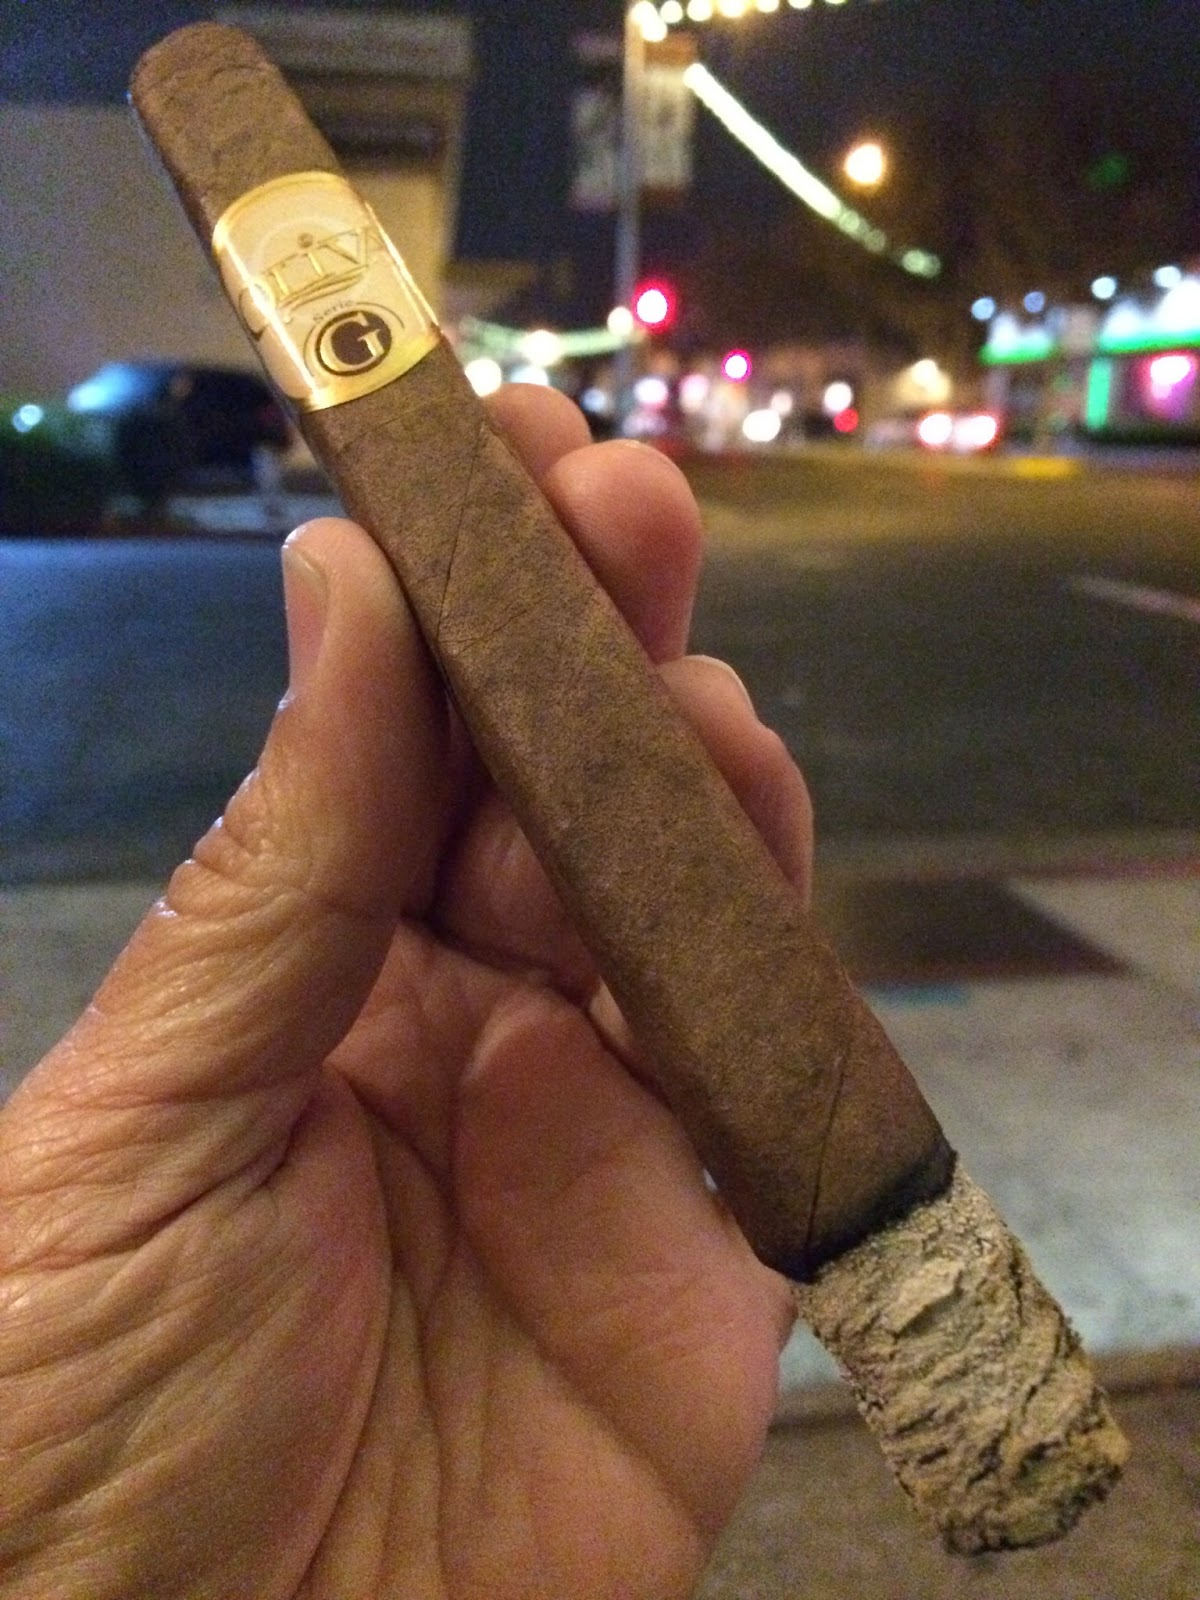 Oliva Serie G cigar 2